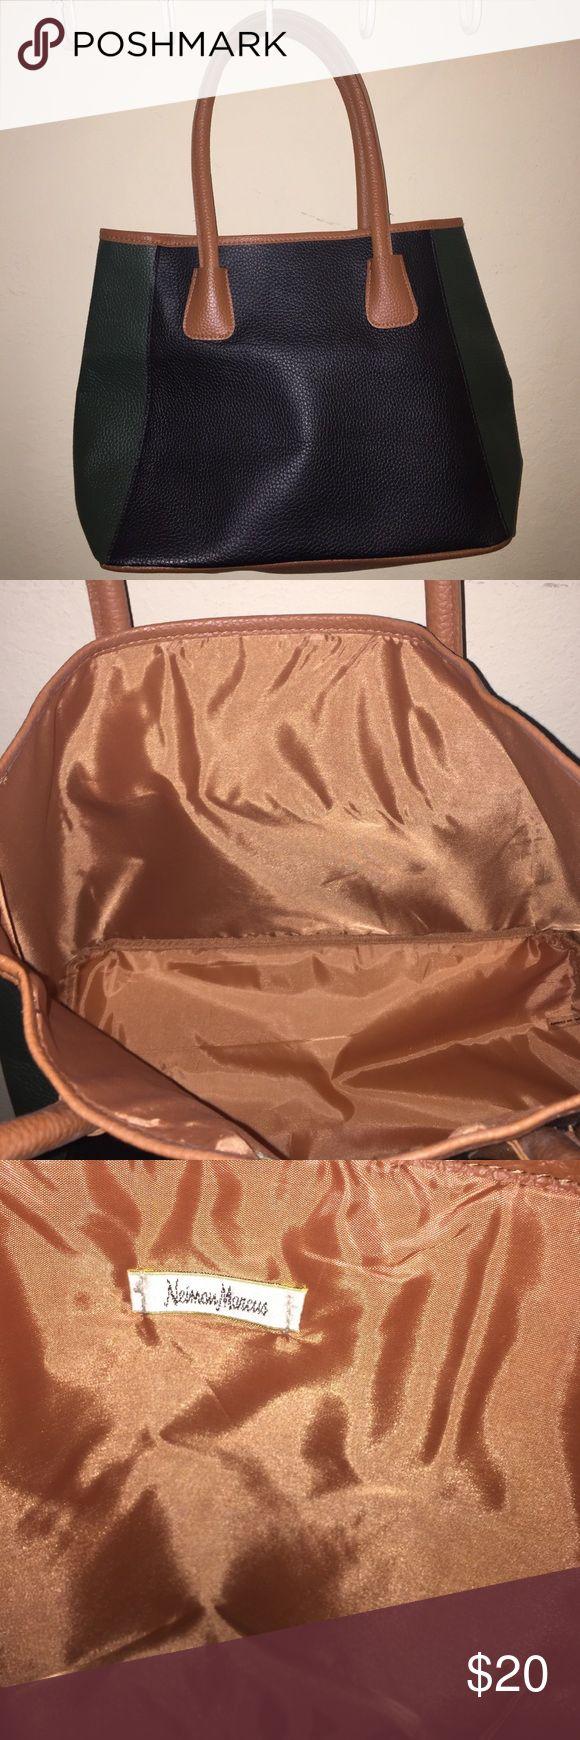 Nemin Marcus bag Never worn, excellent condition,  Neiman Marcus bag Neiman Marcus Bags Mini Bags